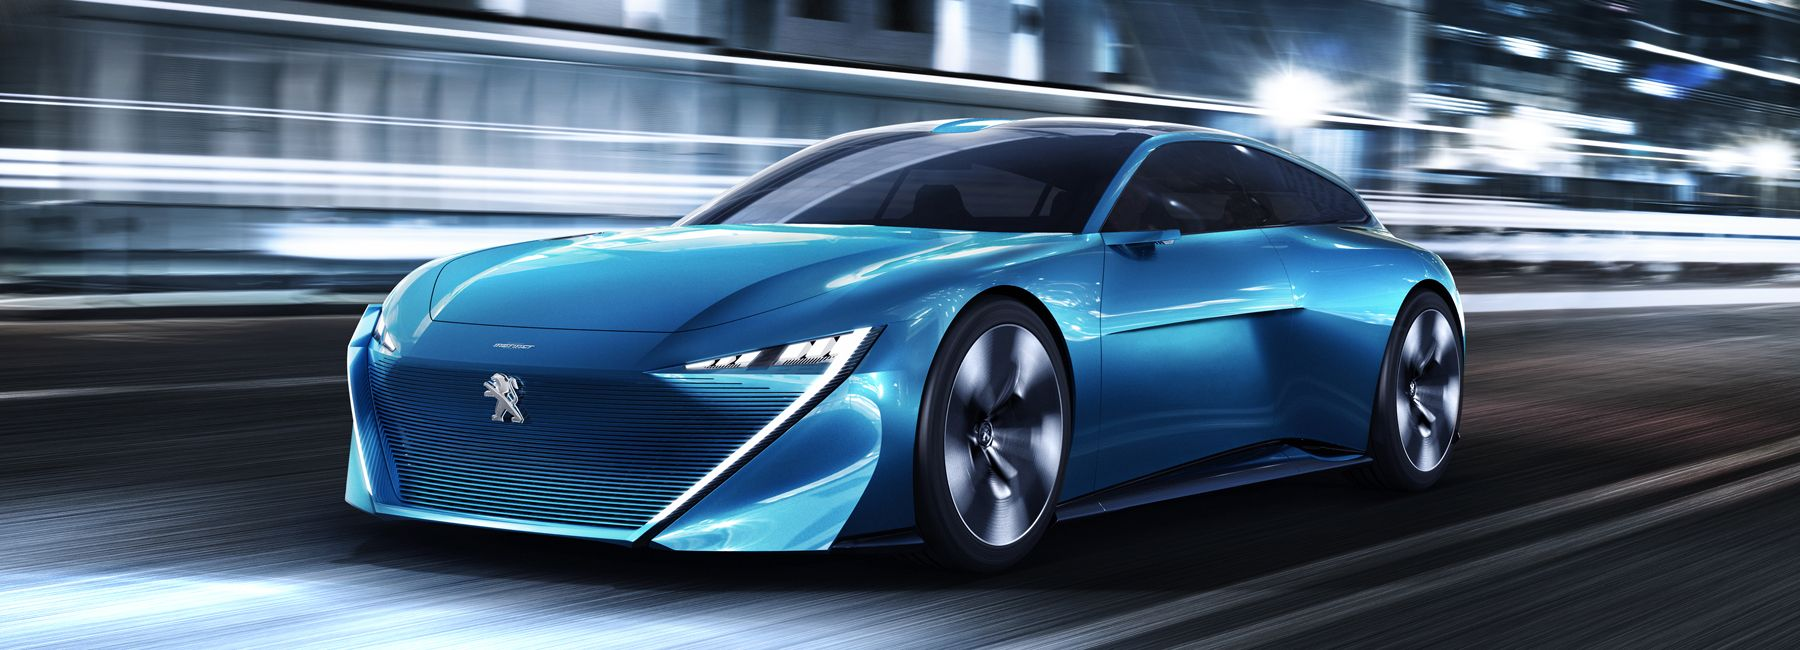 Peugeot instinct self driving concept car designboom cars pinterest cars technology and electric